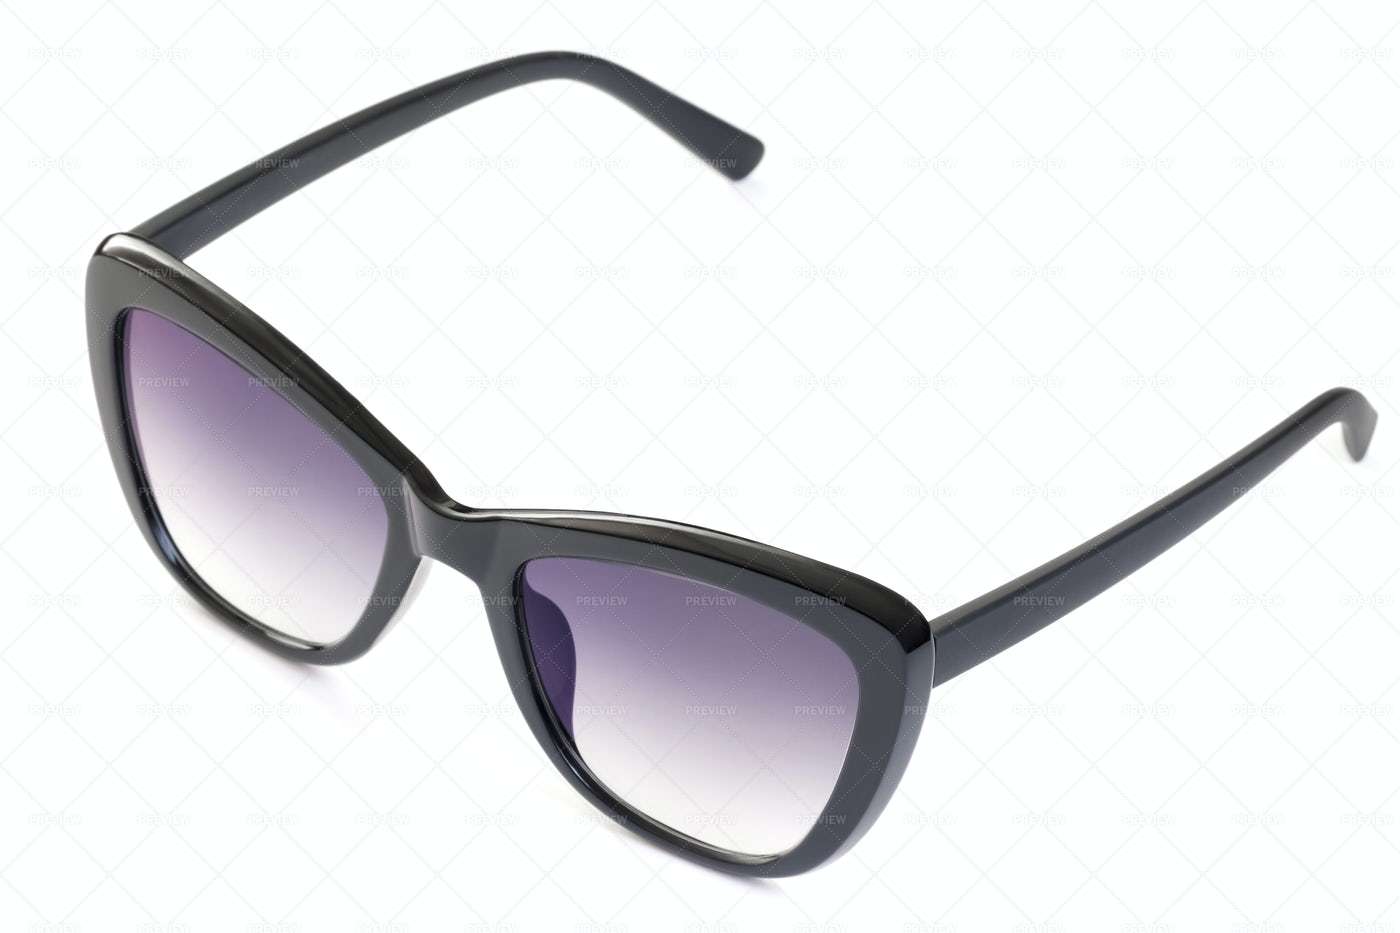 Fashionable Sunglasses: Stock Photos